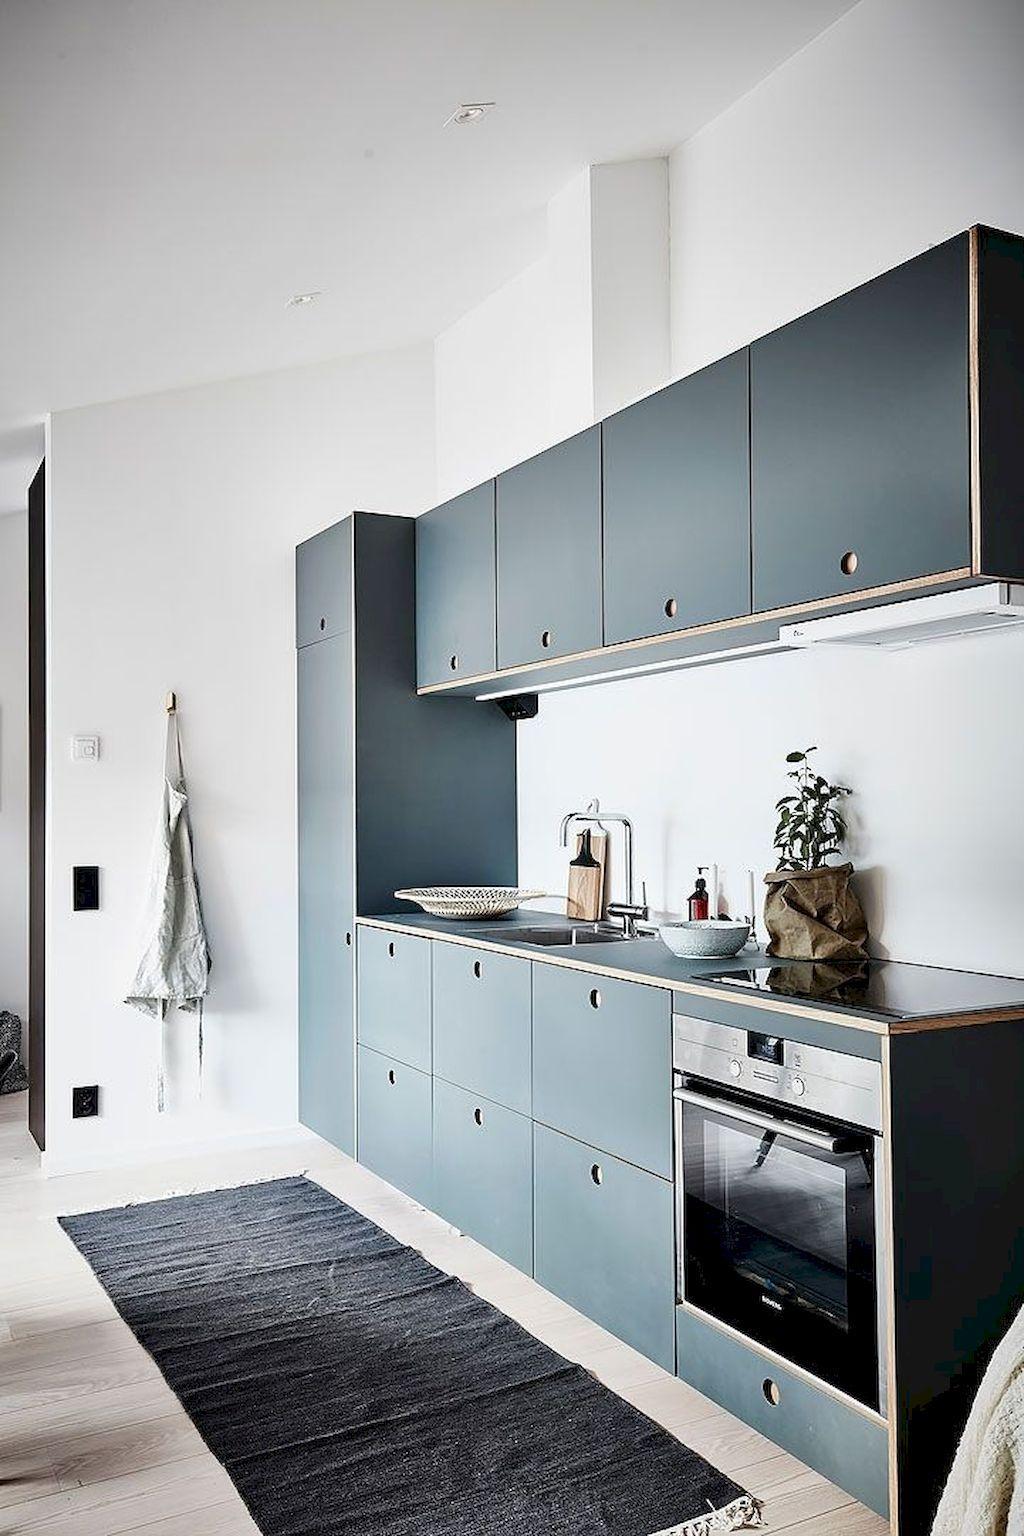 Amazing Small Apartment Kitchen Decor Ideas My Dream Home